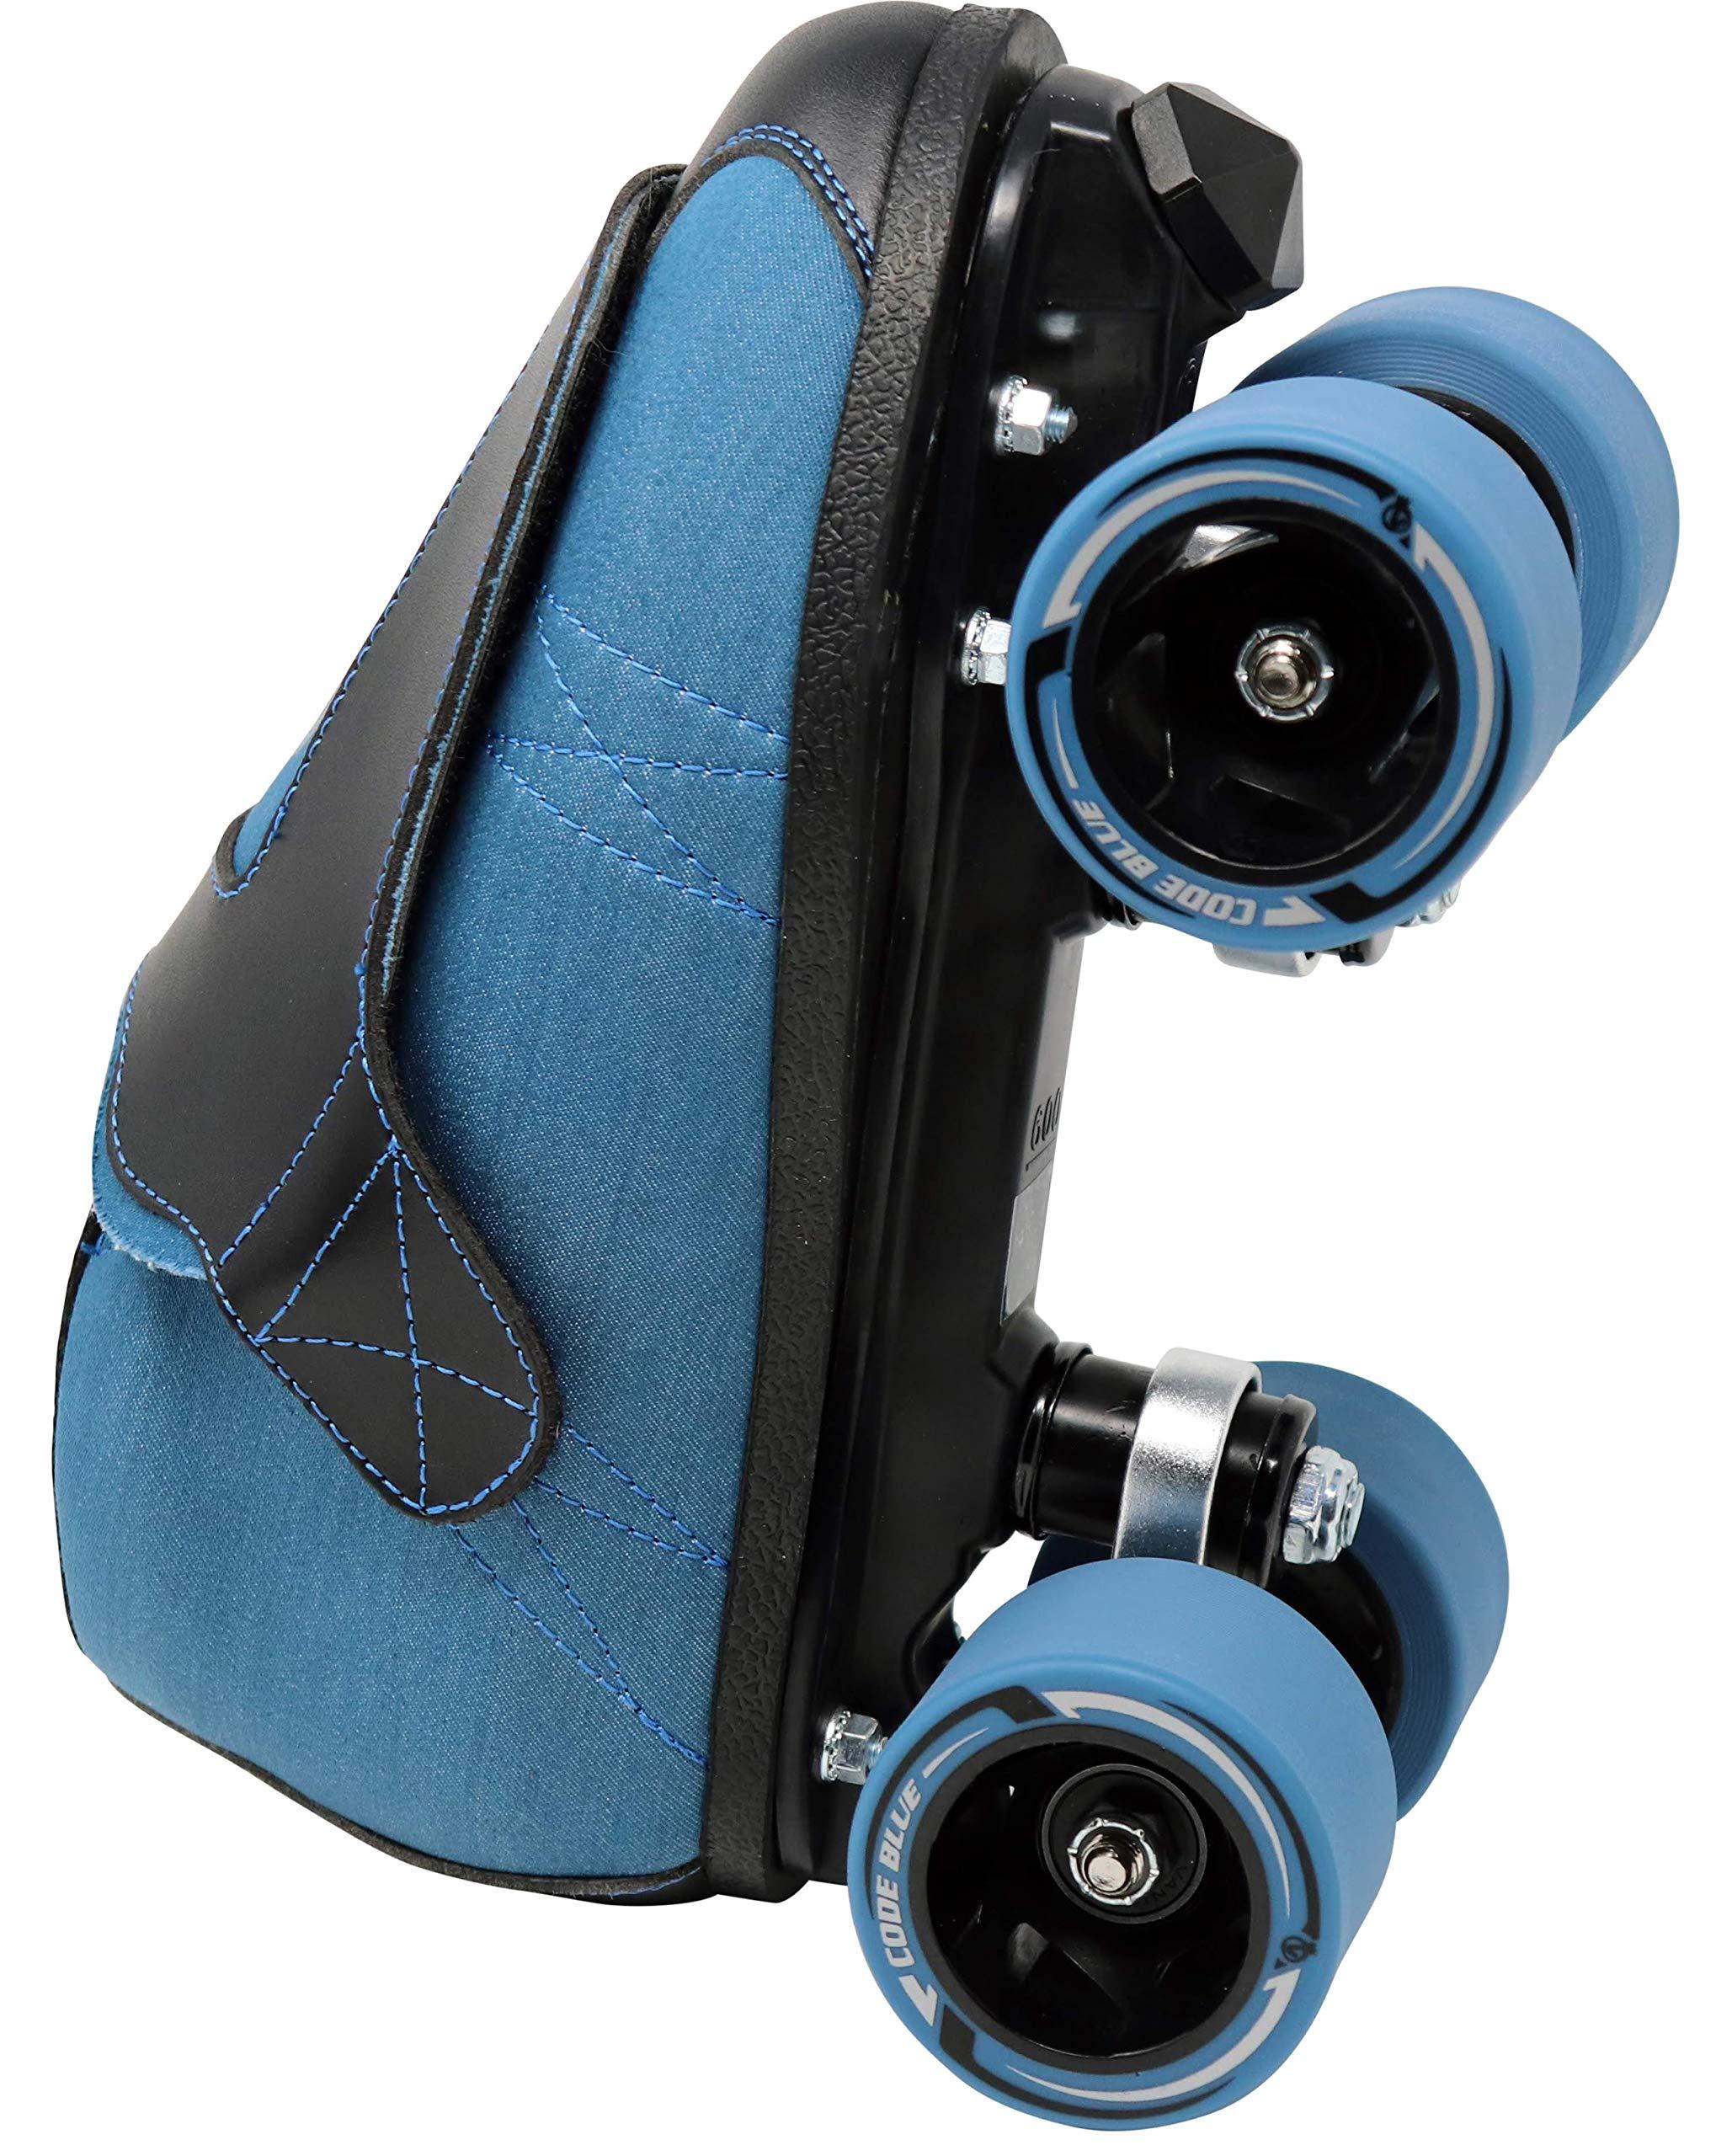 VNLA Code Blue Jam Skate - Mens & Womens Speed Skates - Quad Skates for Women & Men - Adjustable Roller Skate/Rollerskates - Outdoor & Indoor Adult Quad Skate - Kid/Kids Roller Skates (Size 9) by VNLA (Image #5)